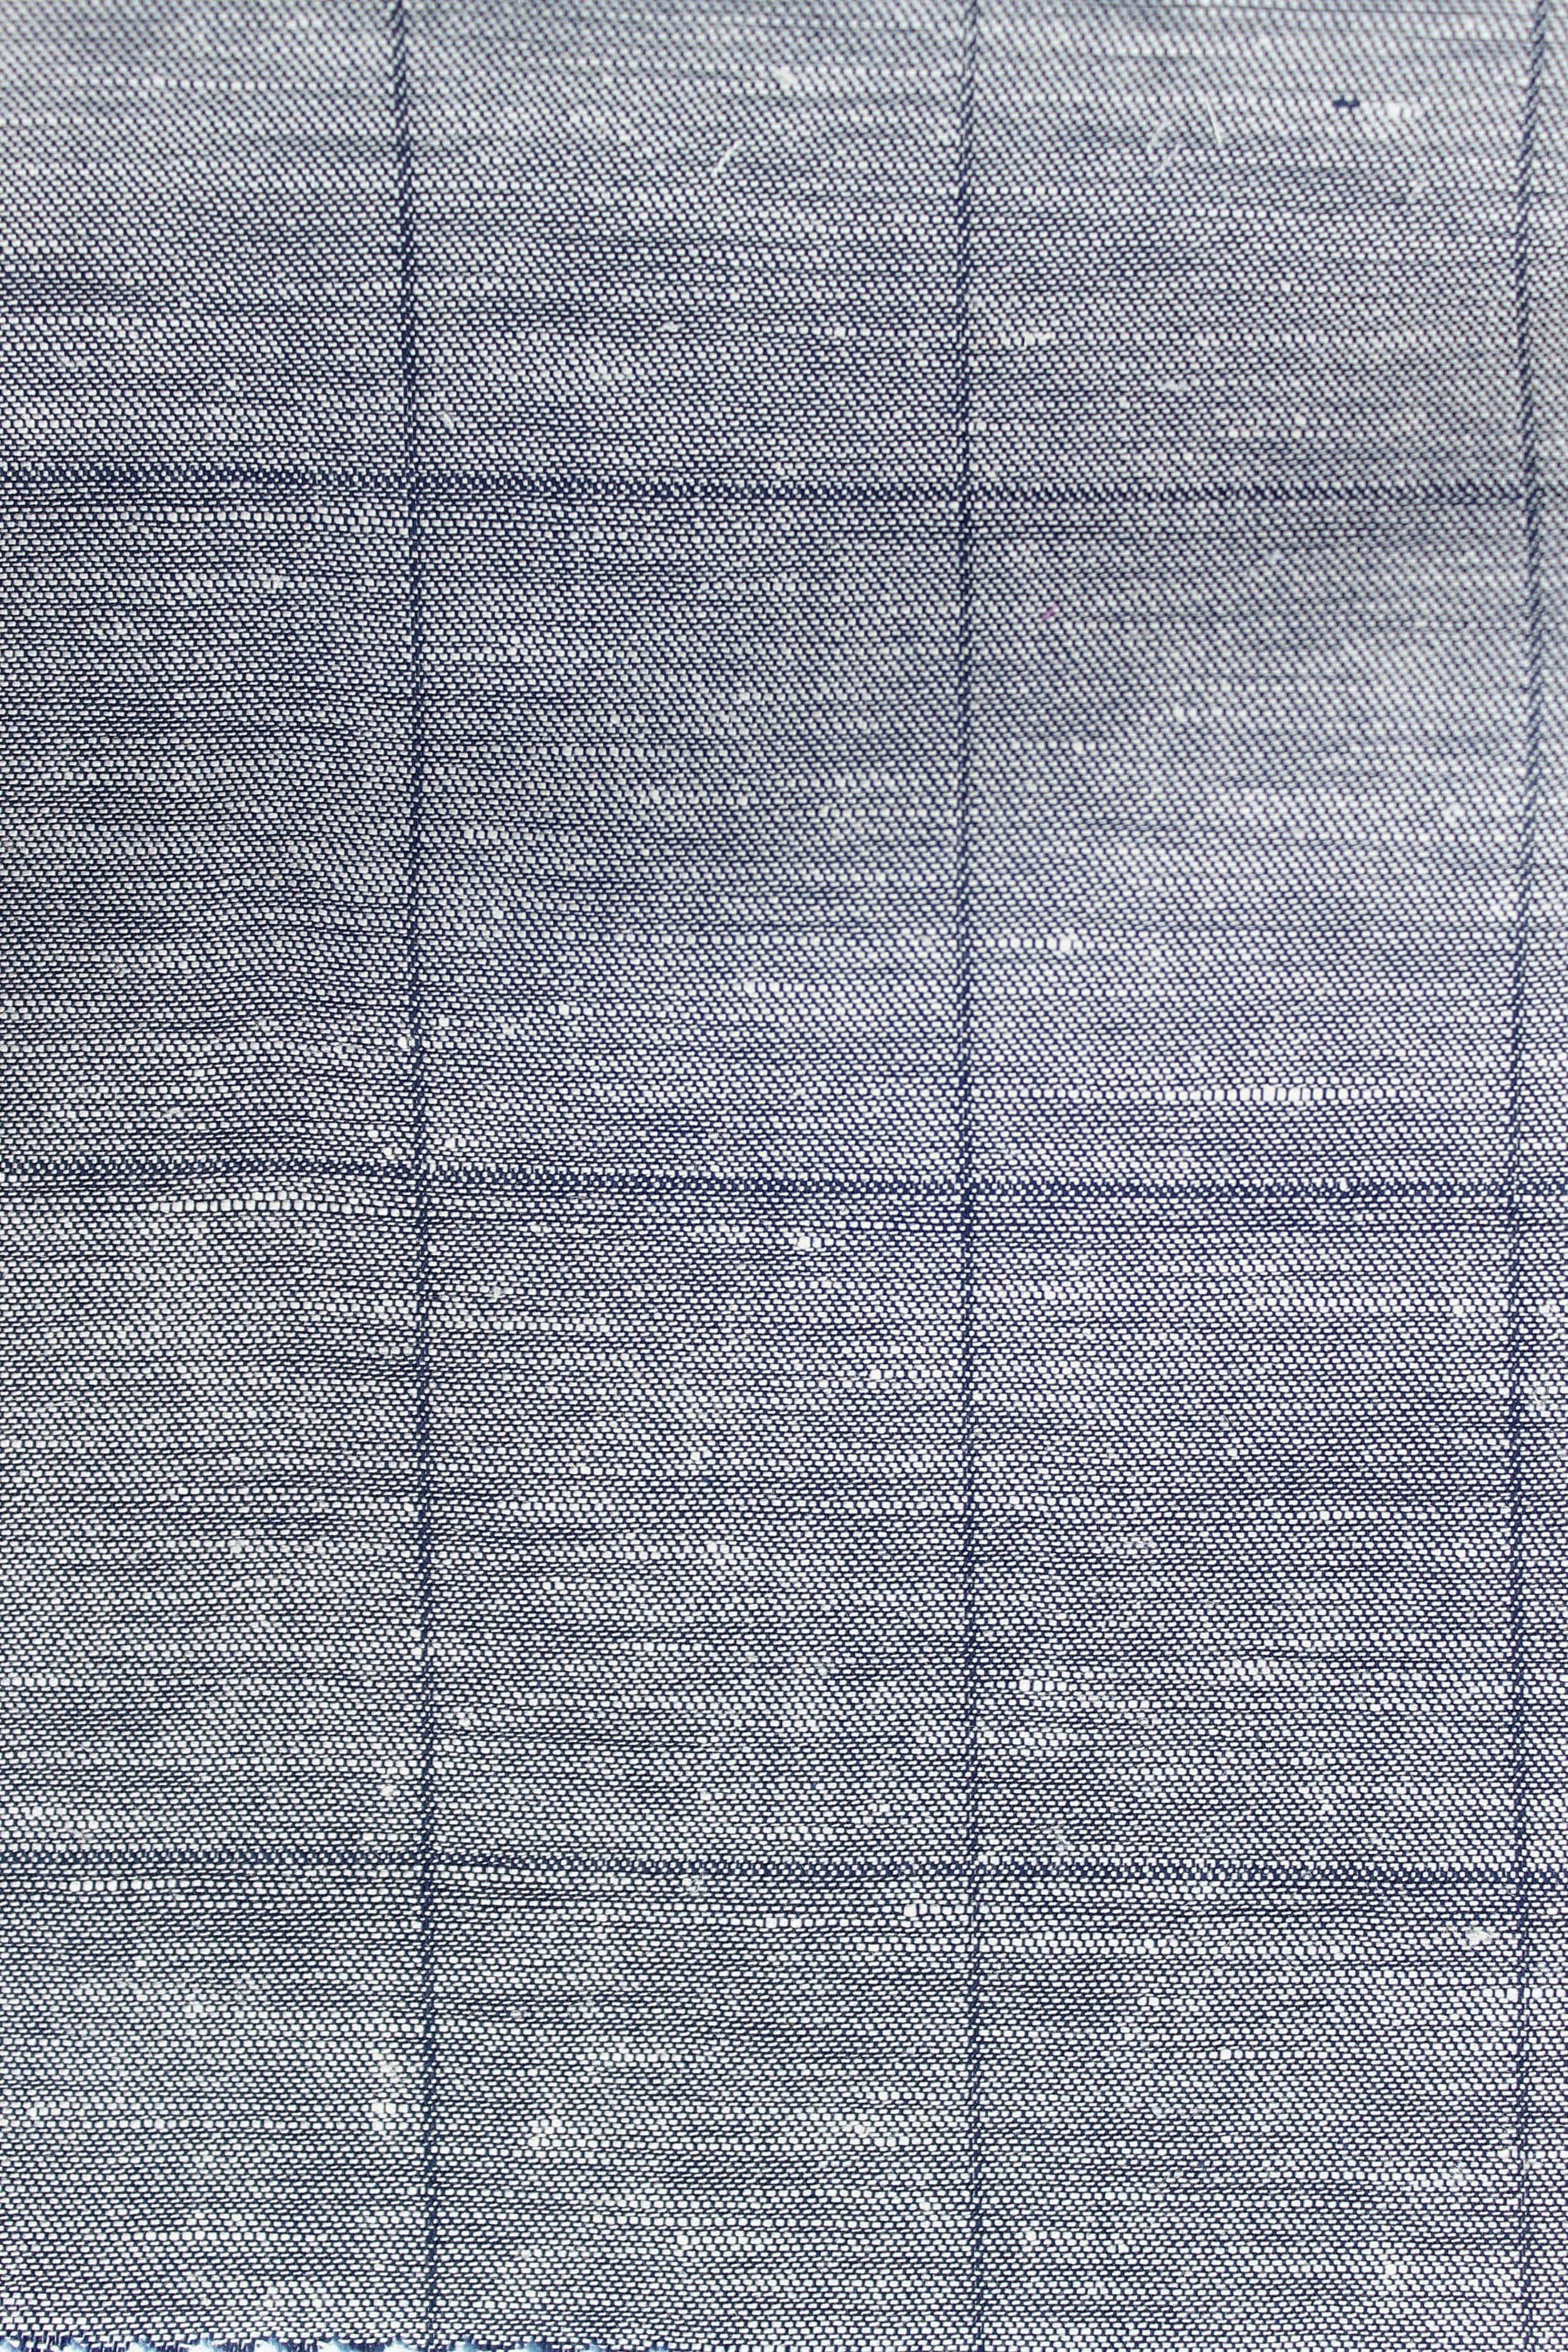 L114 Slate Windowpane Linen.JPG